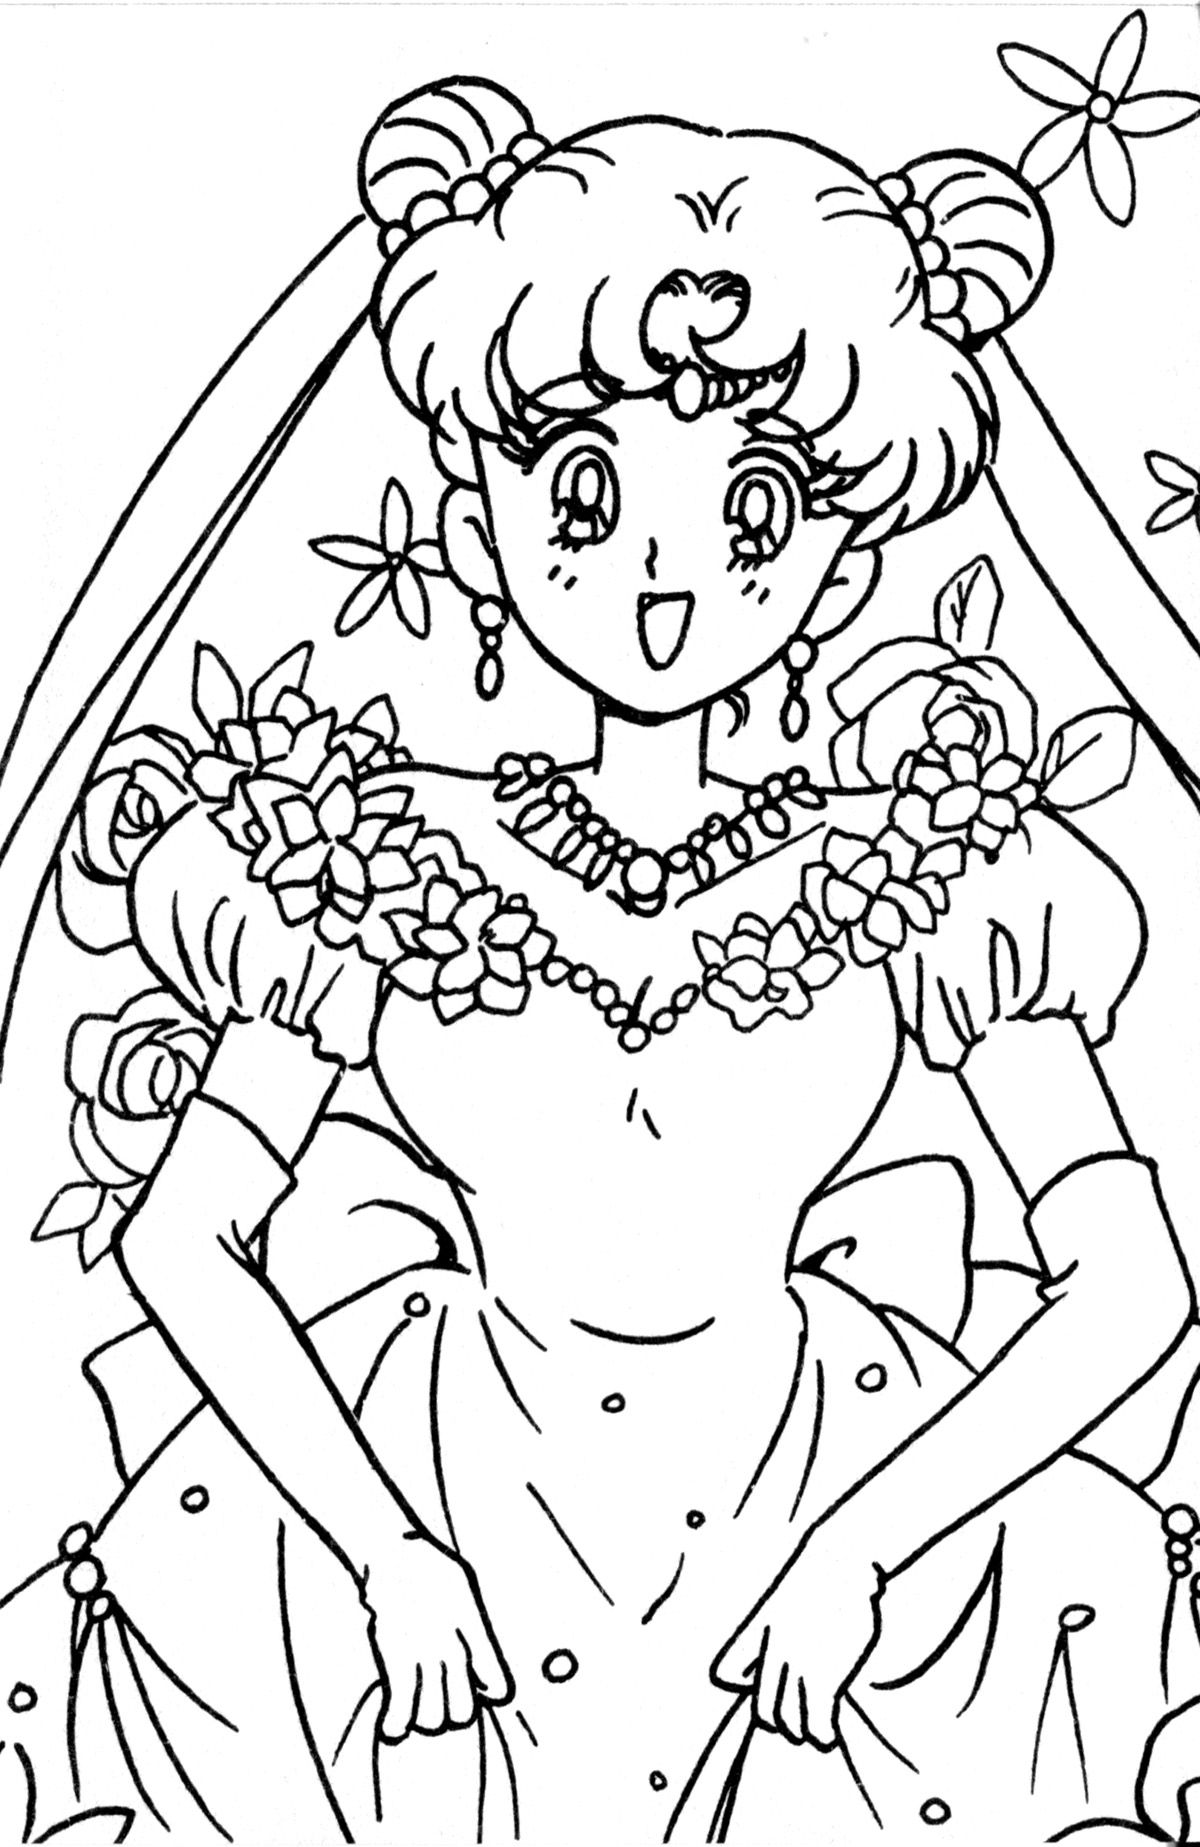 Tsuki Matsuri The Sailormoon Coloring Book Archive Sailor Moon Coloring Pages Coloring Books Cute Coloring Pages